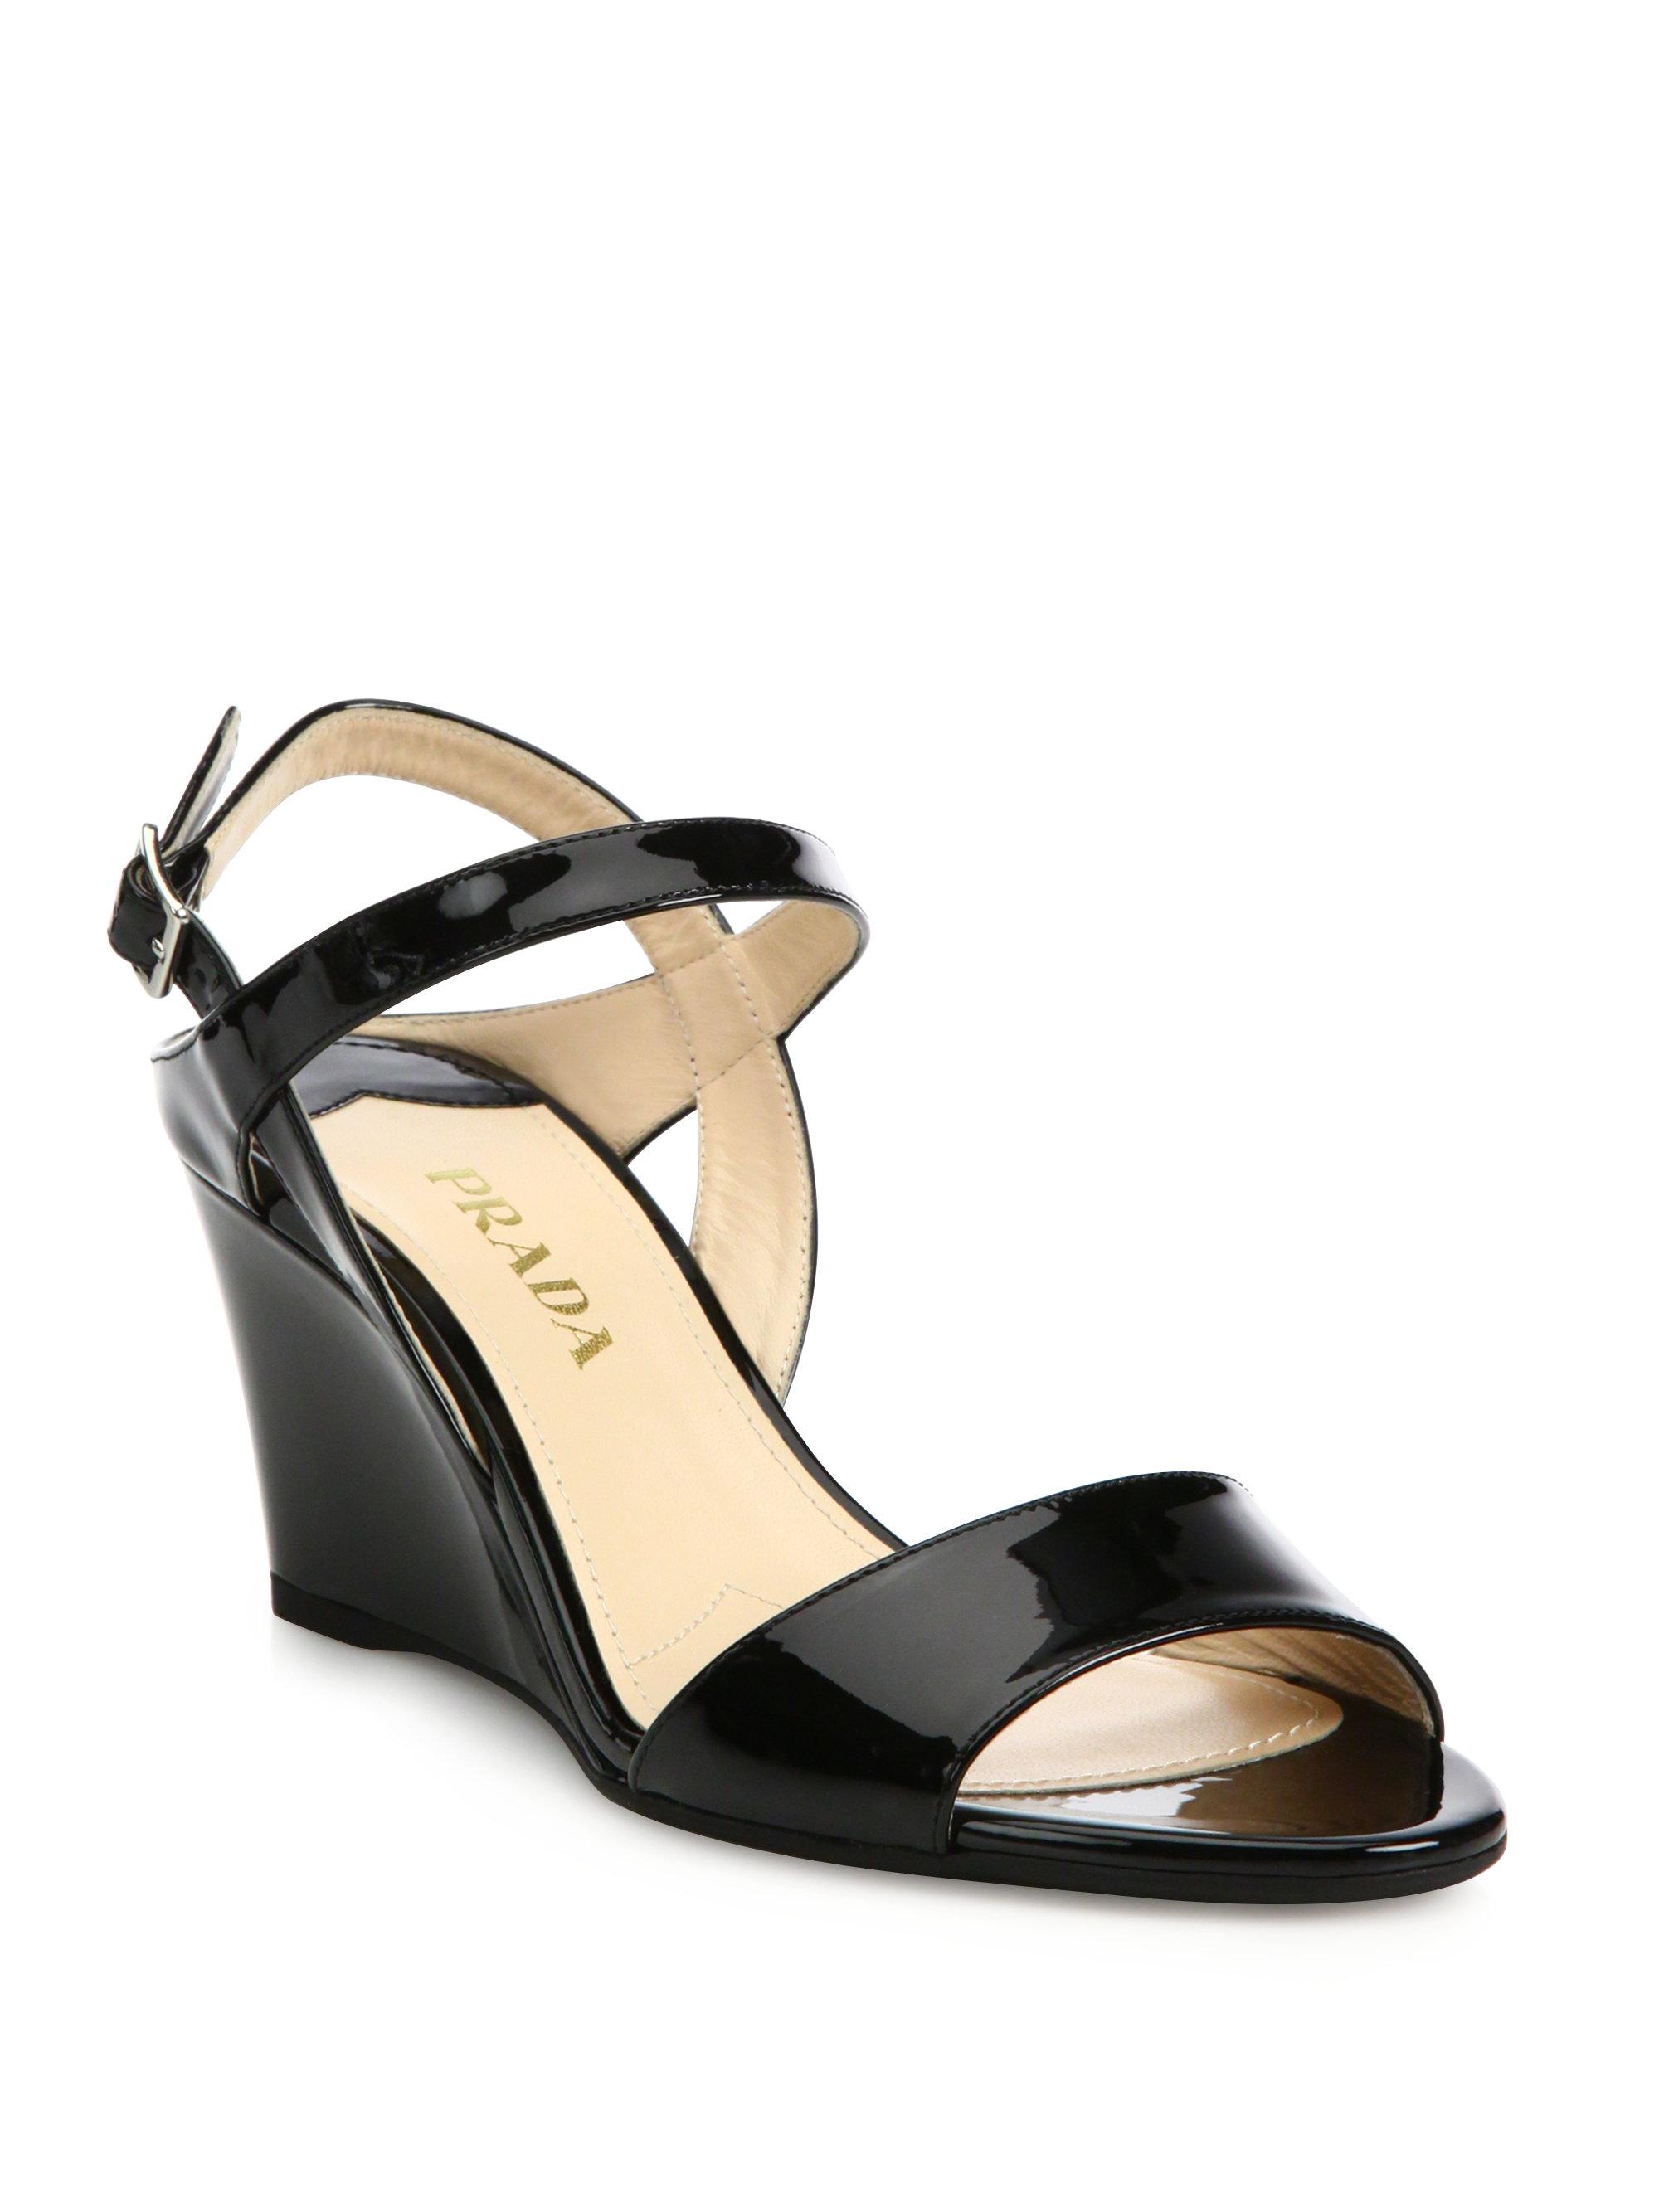 2e29bfb31b Prada Black Patent Leather Ankle-strap Wedge Sandals